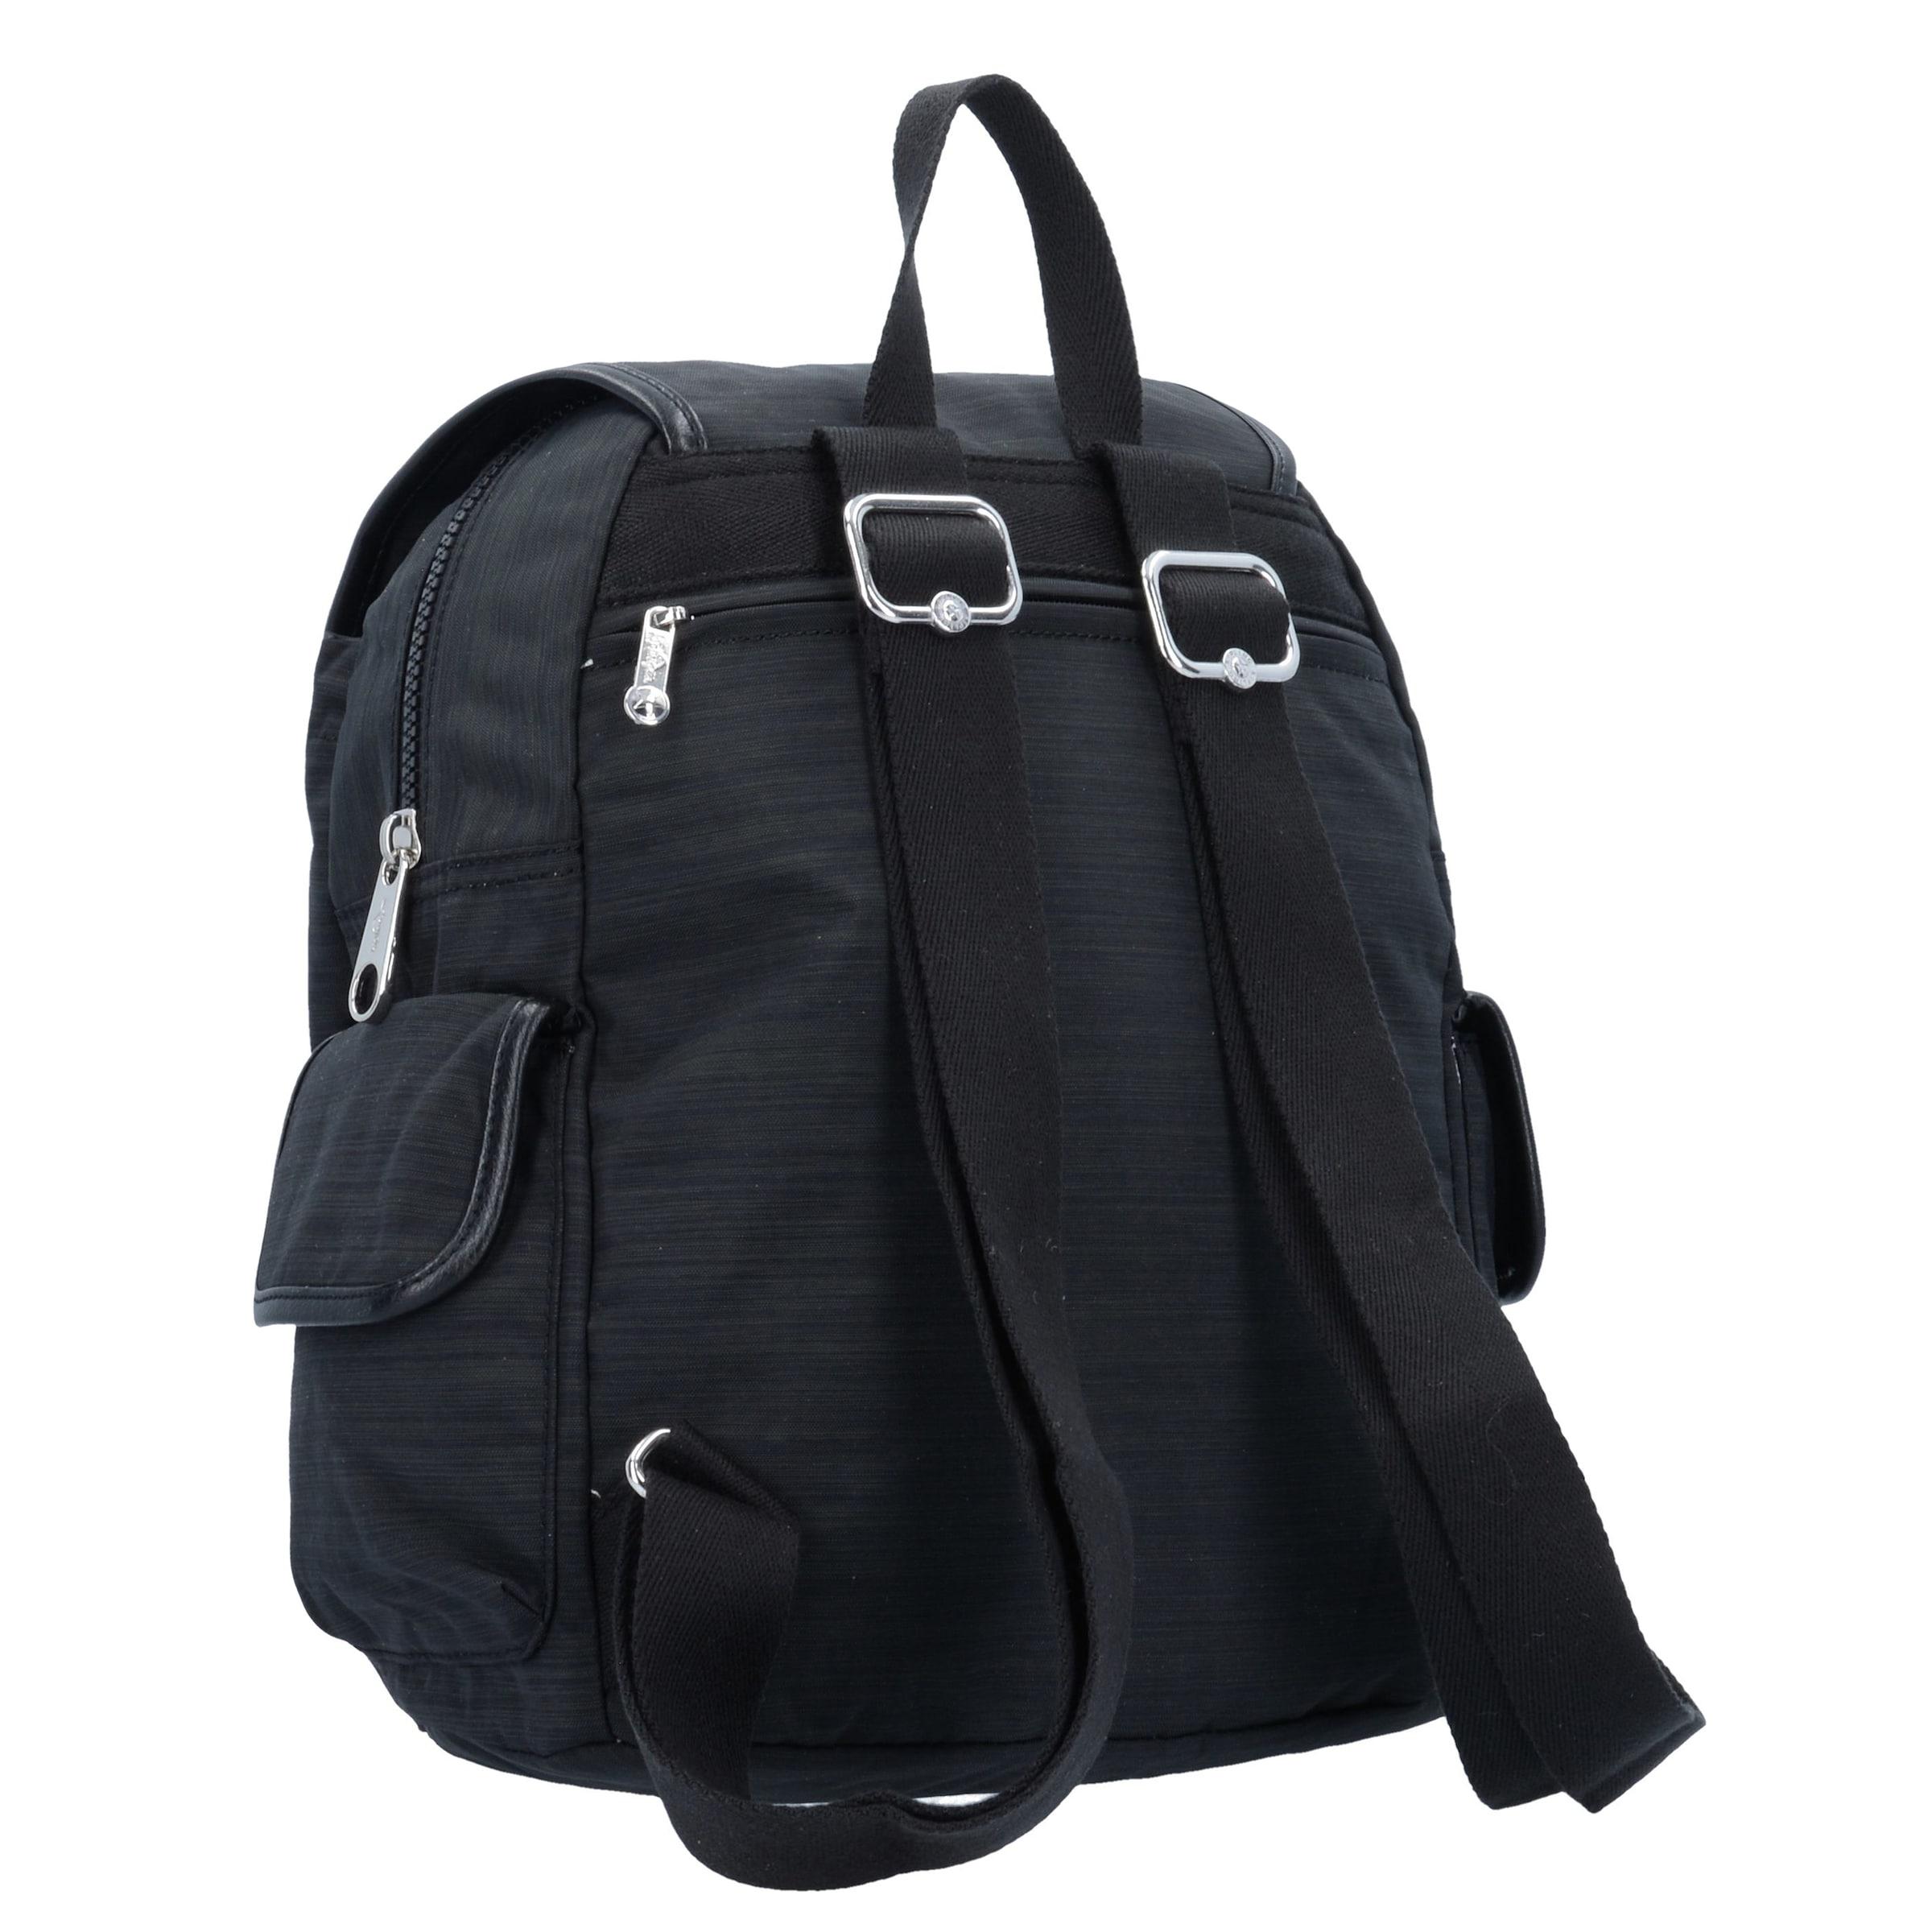 City S Basic KIPLING Plus LM Rucksack Pack cm 33 wqtq4ZFx